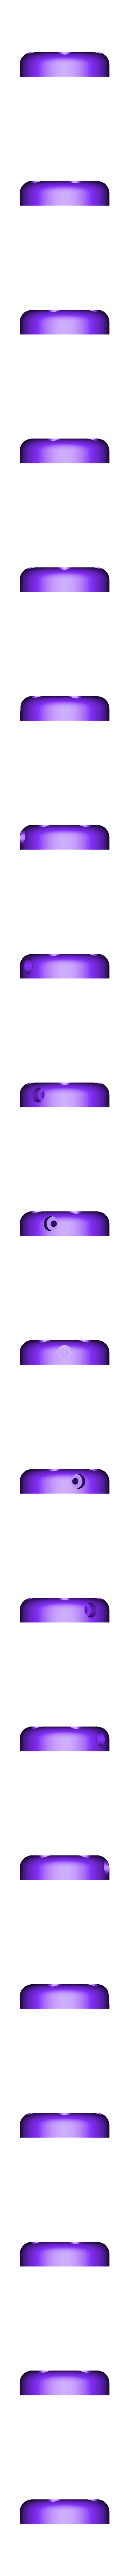 RIGHT CAP.stl Download STL file STEAM POWERED FERRIS WHEEL • 3D print model, Boxermad84